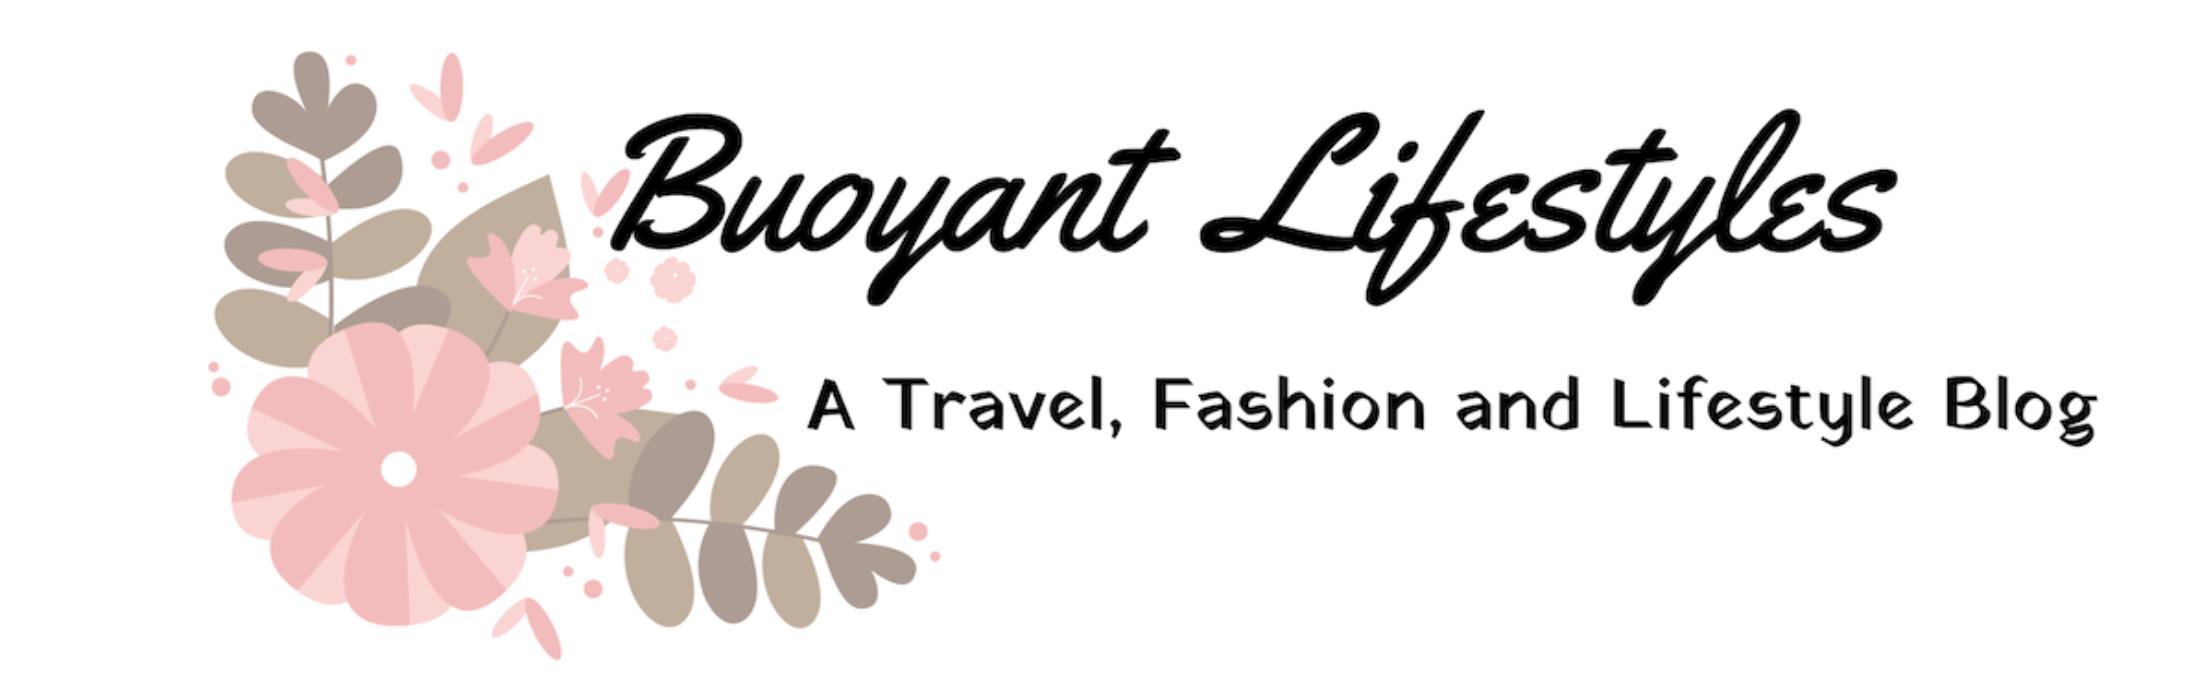 Buoyant Lifestyles